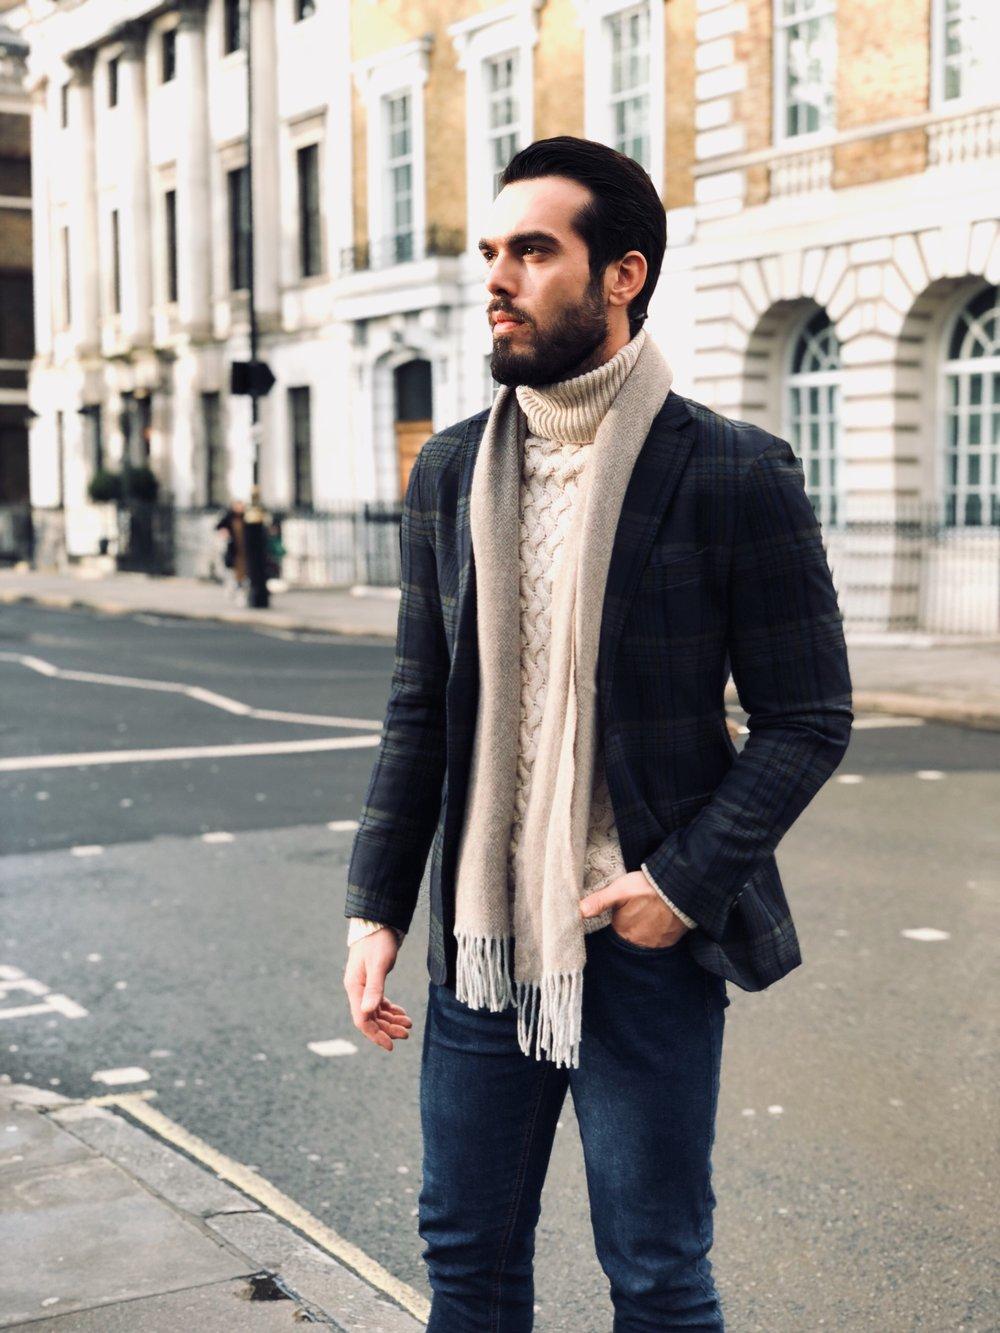 Jacket: Tommy Hilfiger / Jeans: Pepe jeans / Scarf: Hackett London / Knitwear: Massimo Dutti